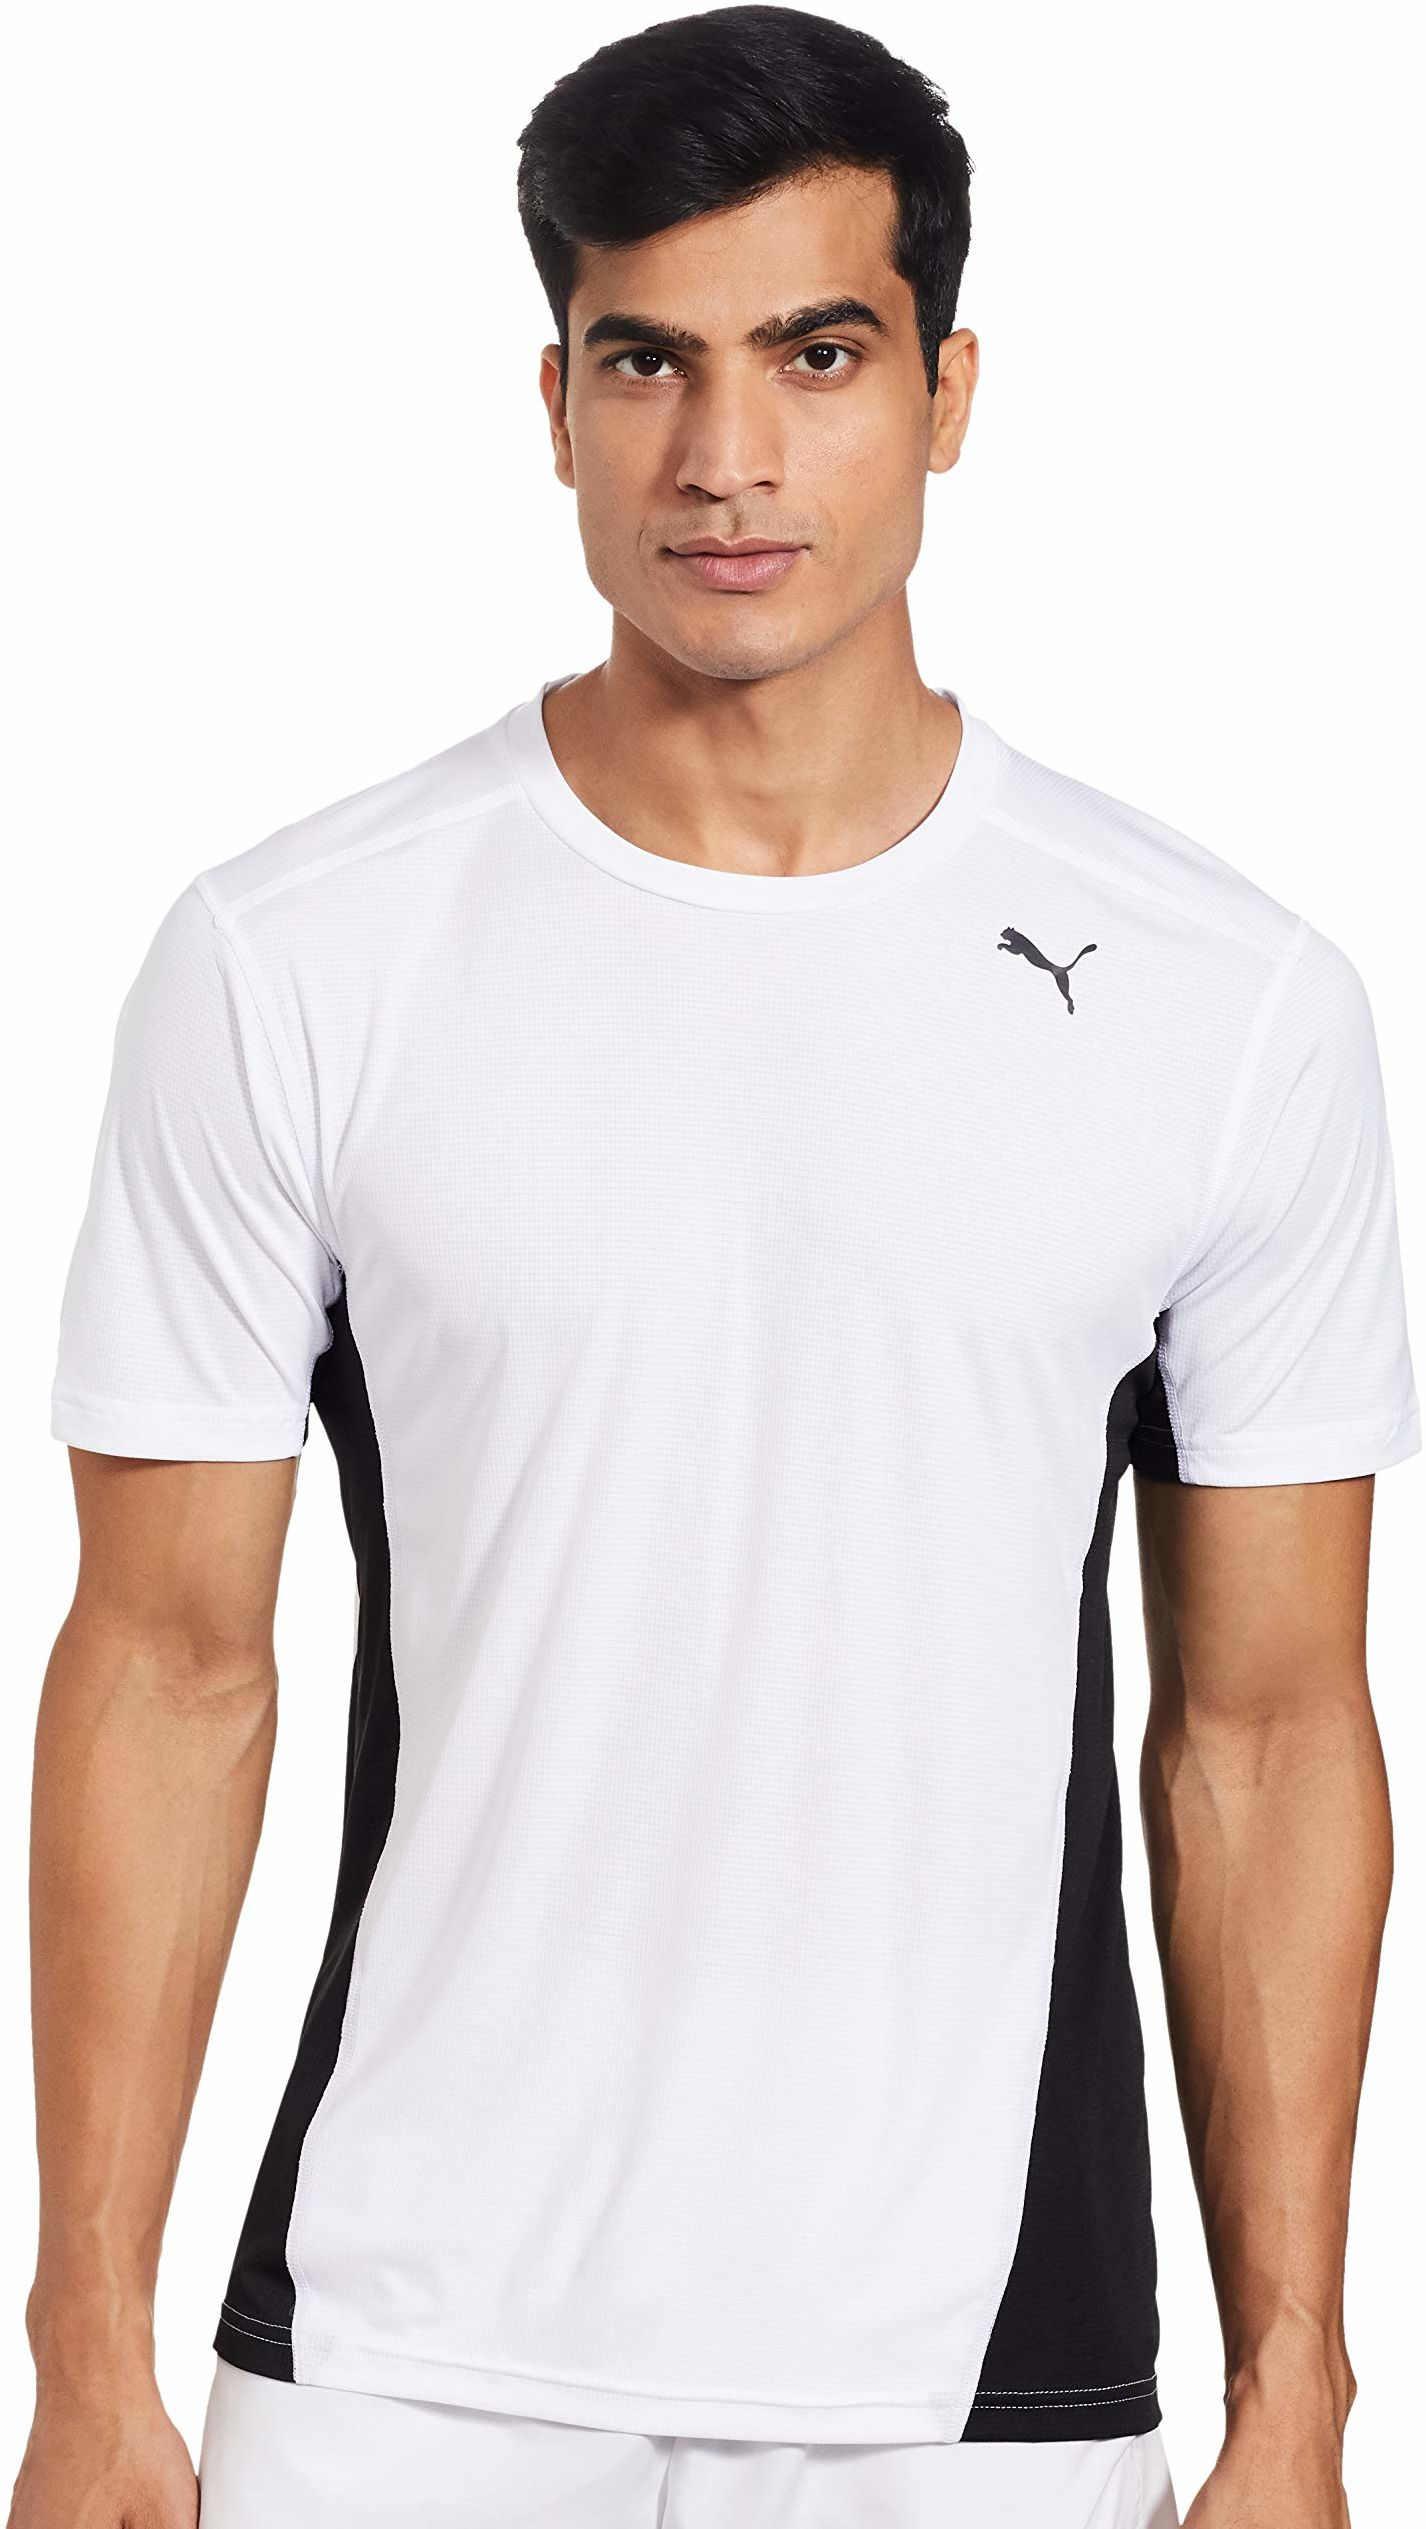 PUMA męska koszulka Cross the Line koszulka, biała czarna, średnia